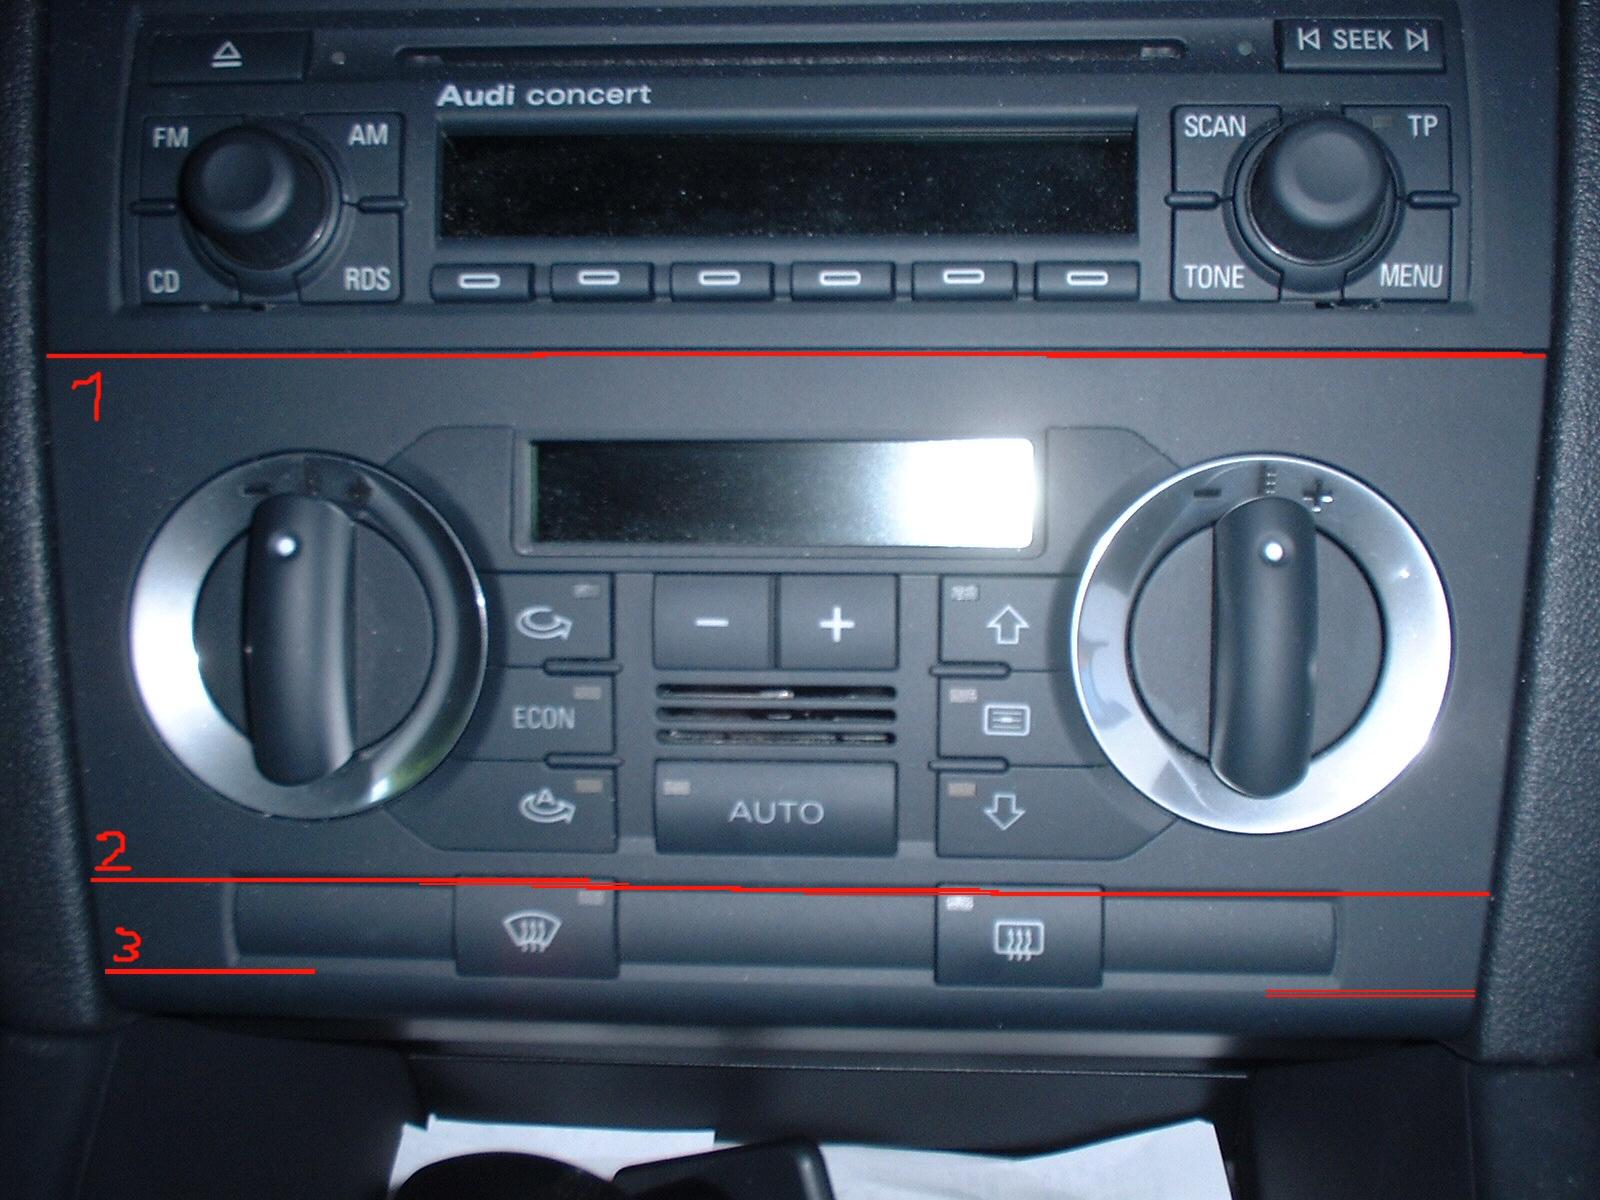 Audi a3 schablone klima bedienteil umbau einfach din auf for Mueble 2 din audi a3 8p